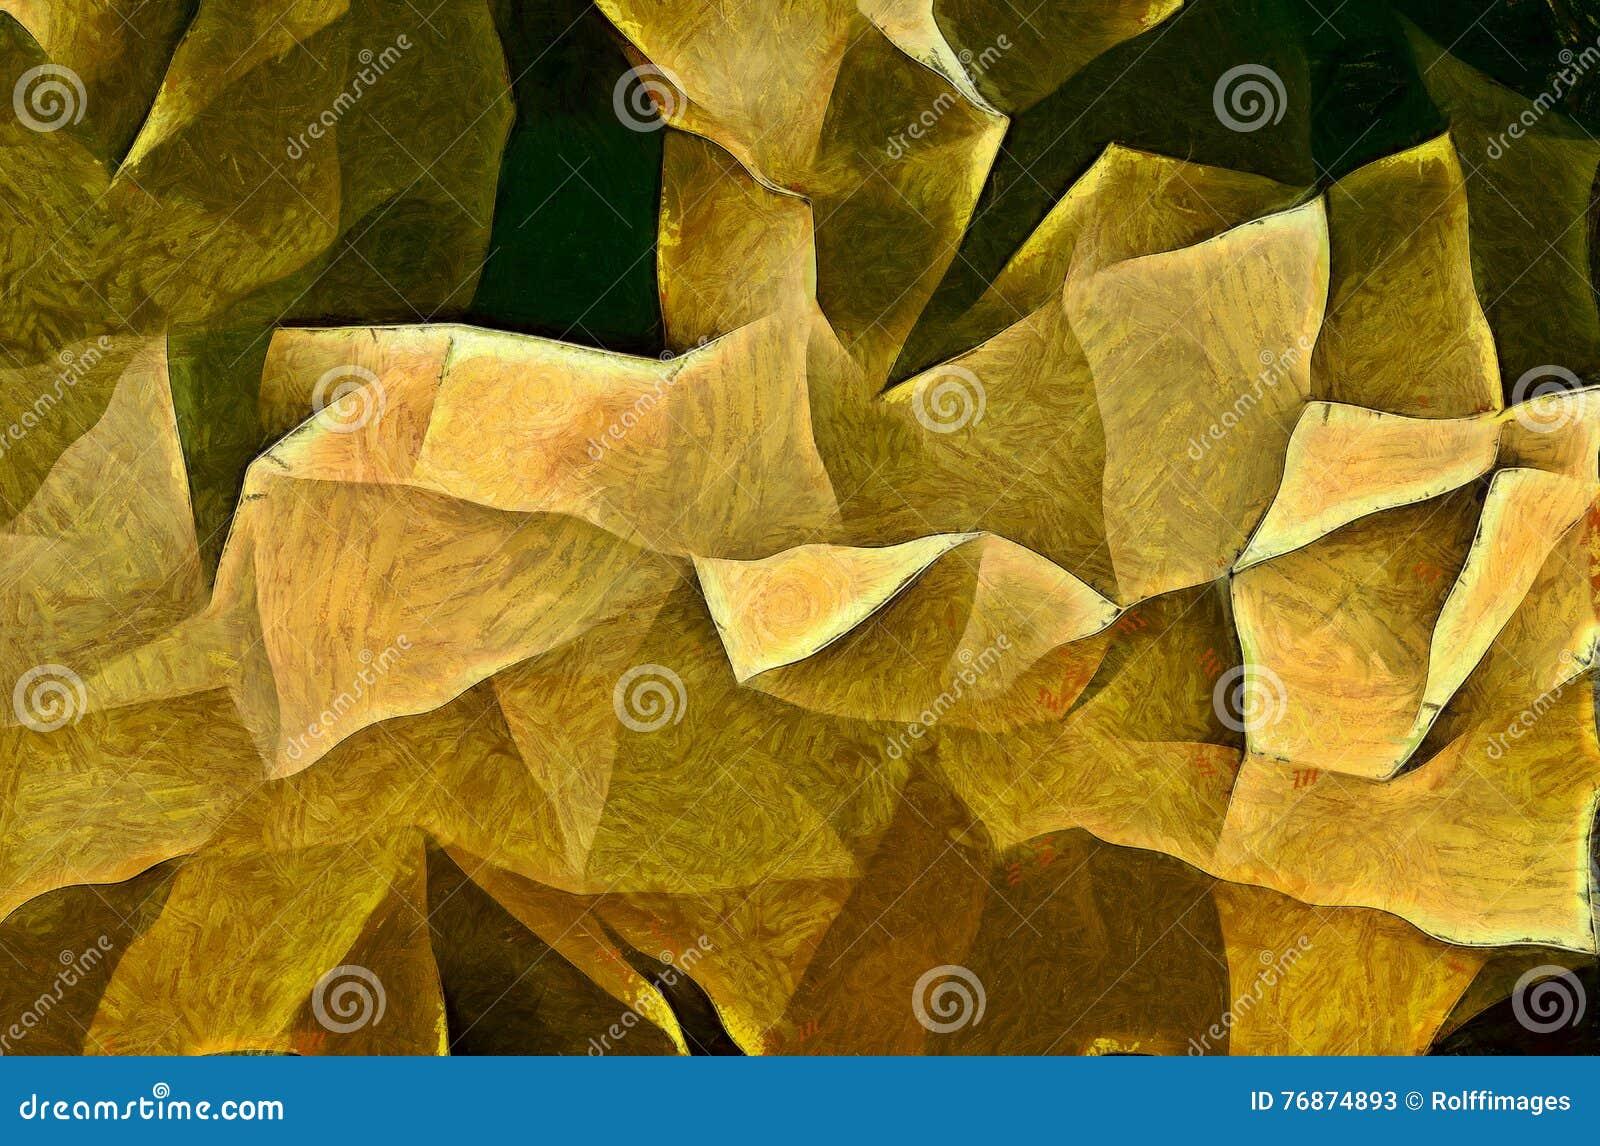 Formas angulares Painterly